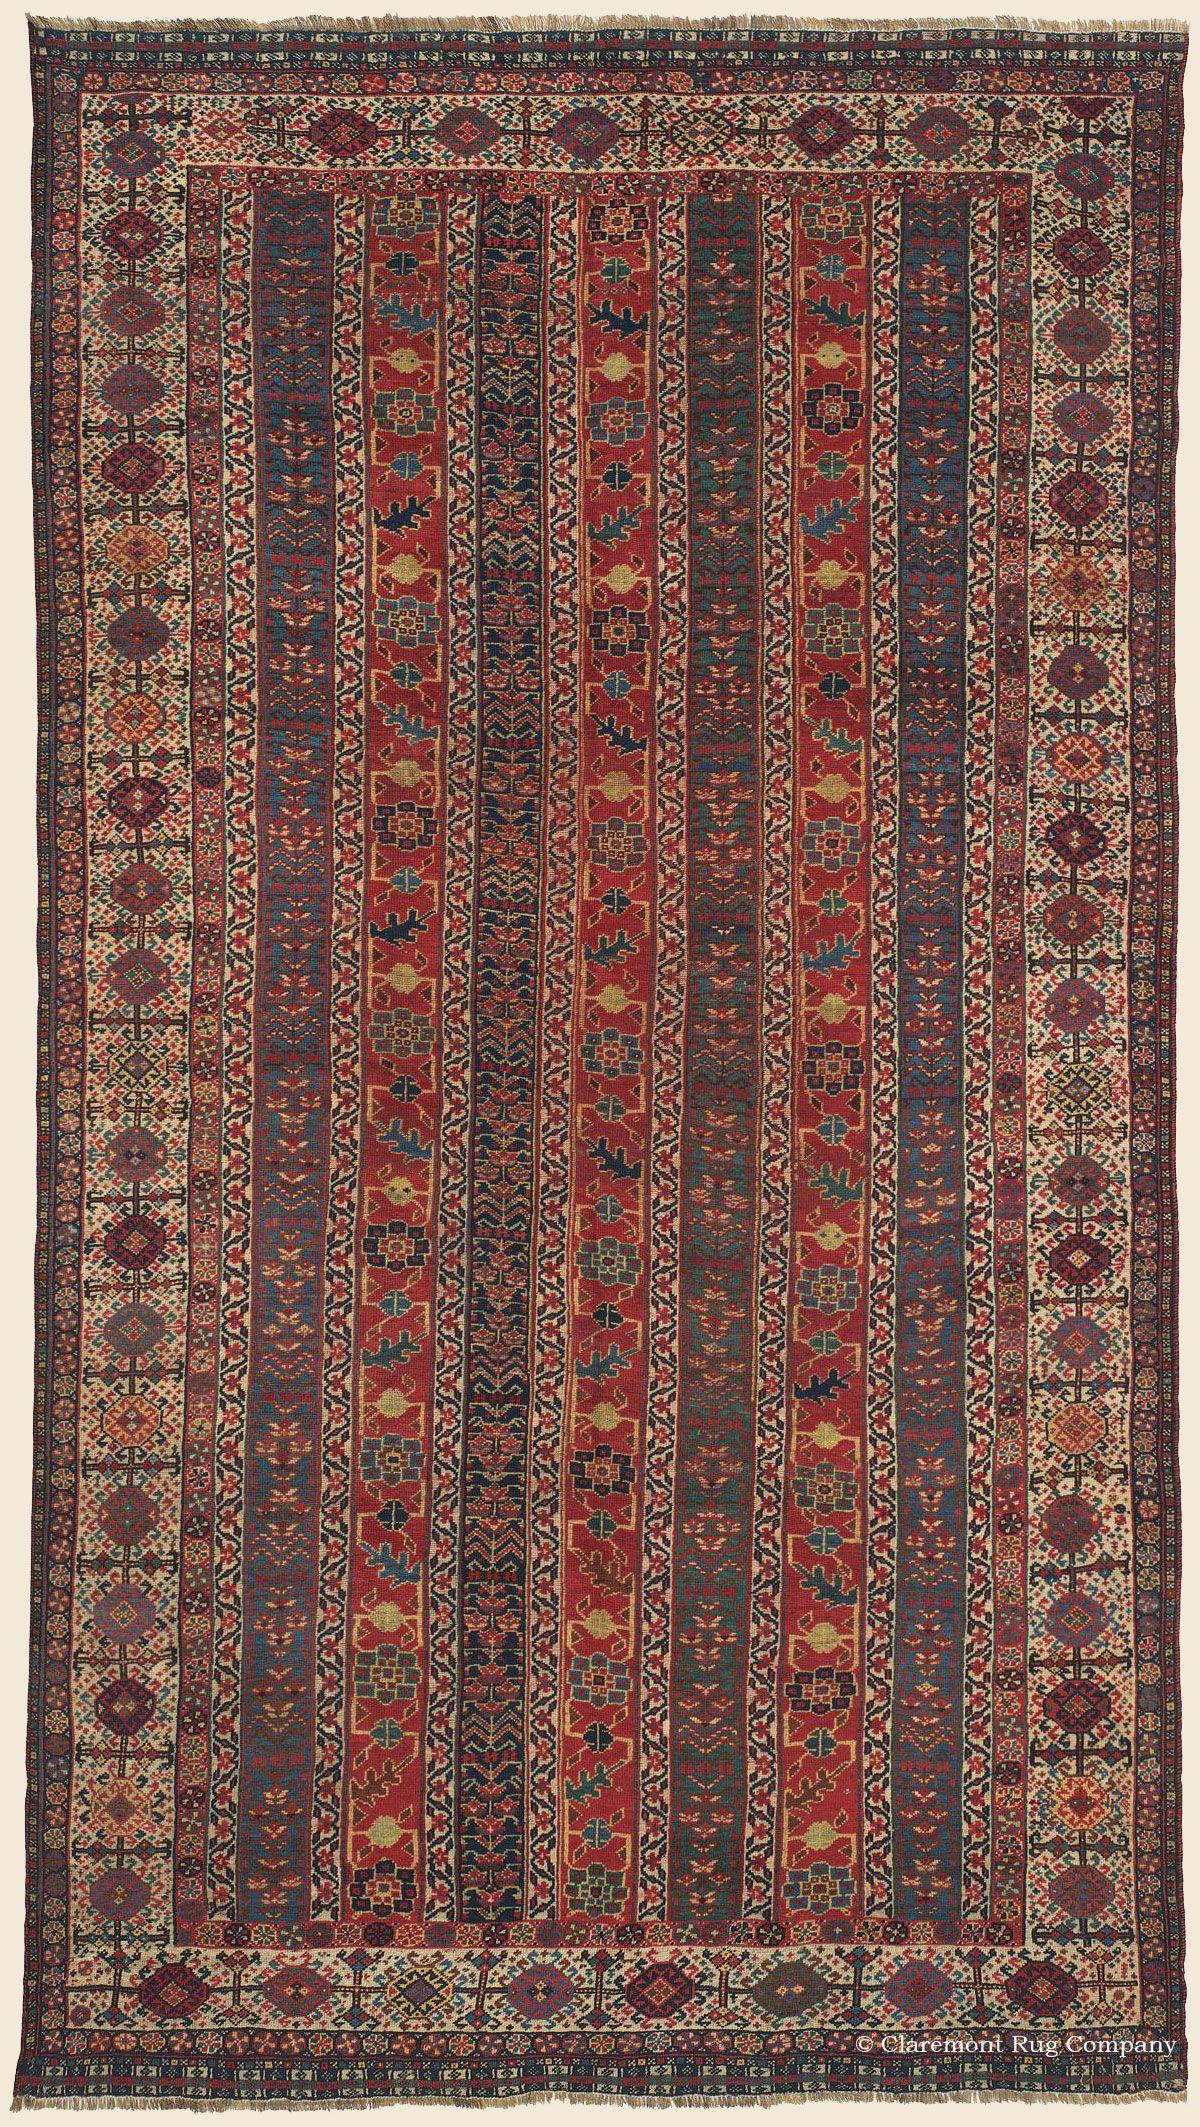 Qashqai Southwest Persian Antique Rug Claremont Company